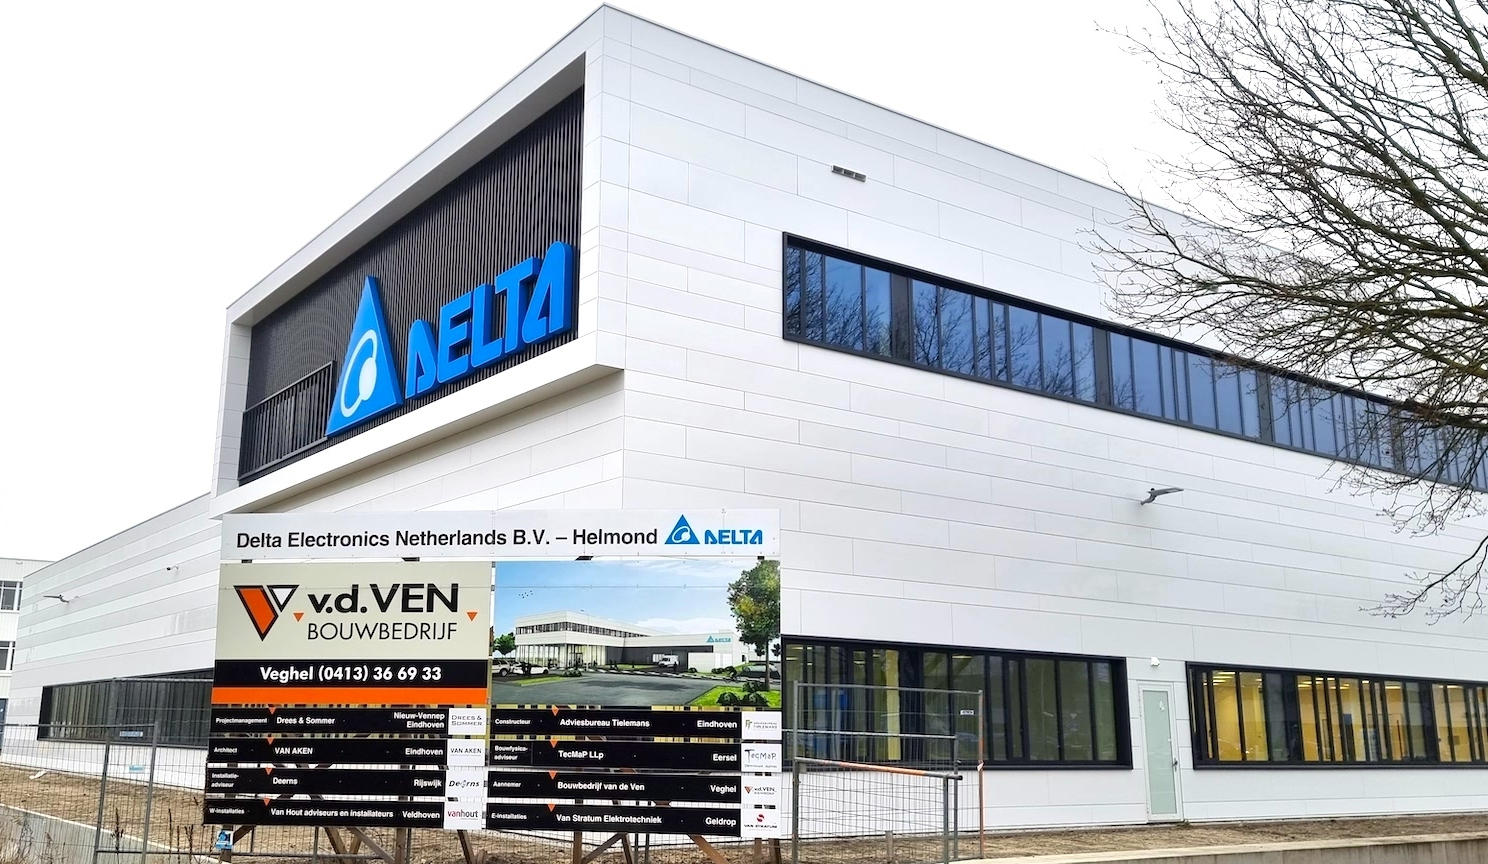 Delta Electronics Bedrijfspand